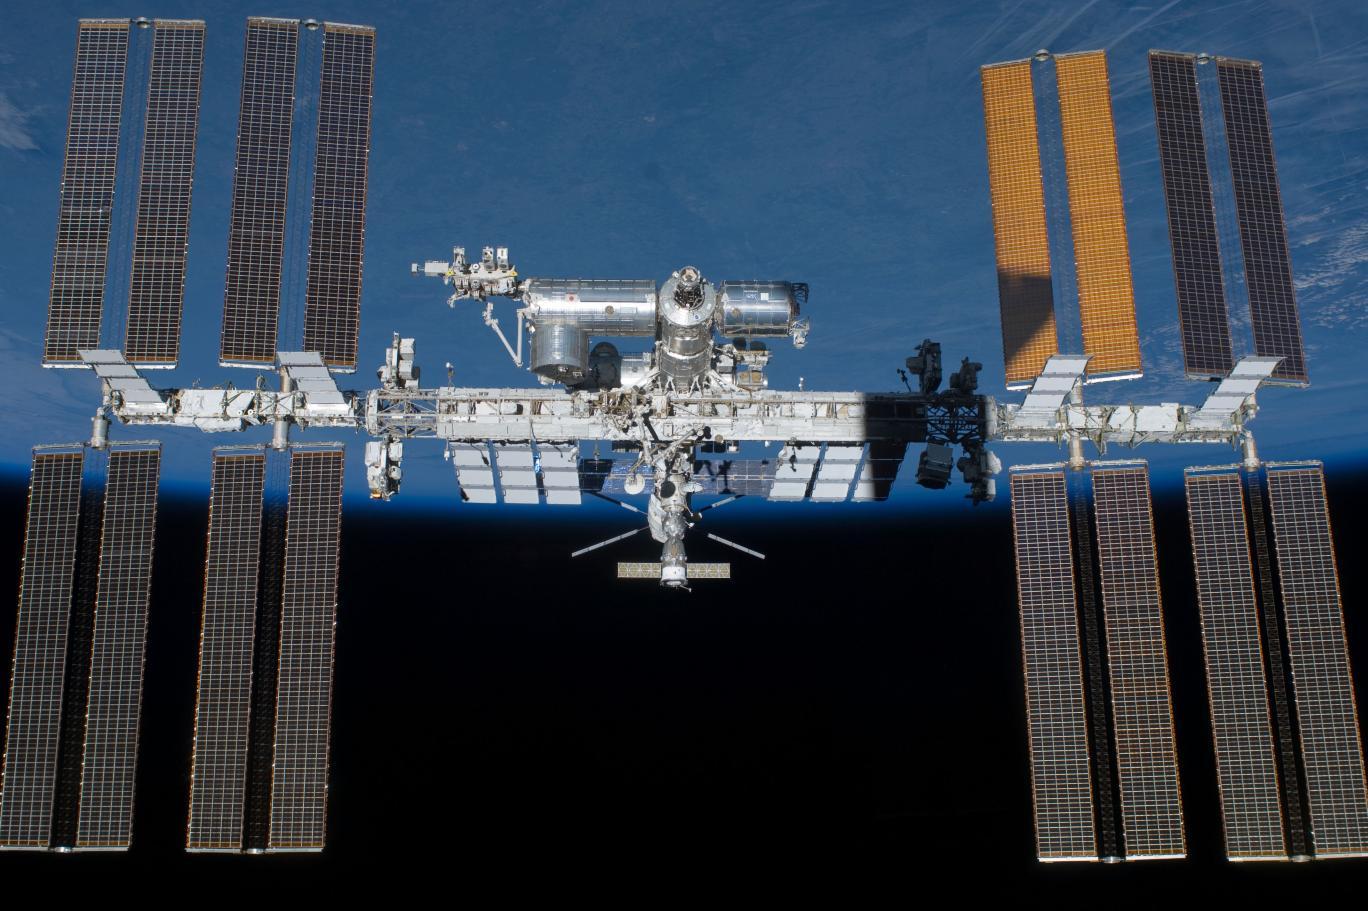 Uzay turizmi Aralık ayında